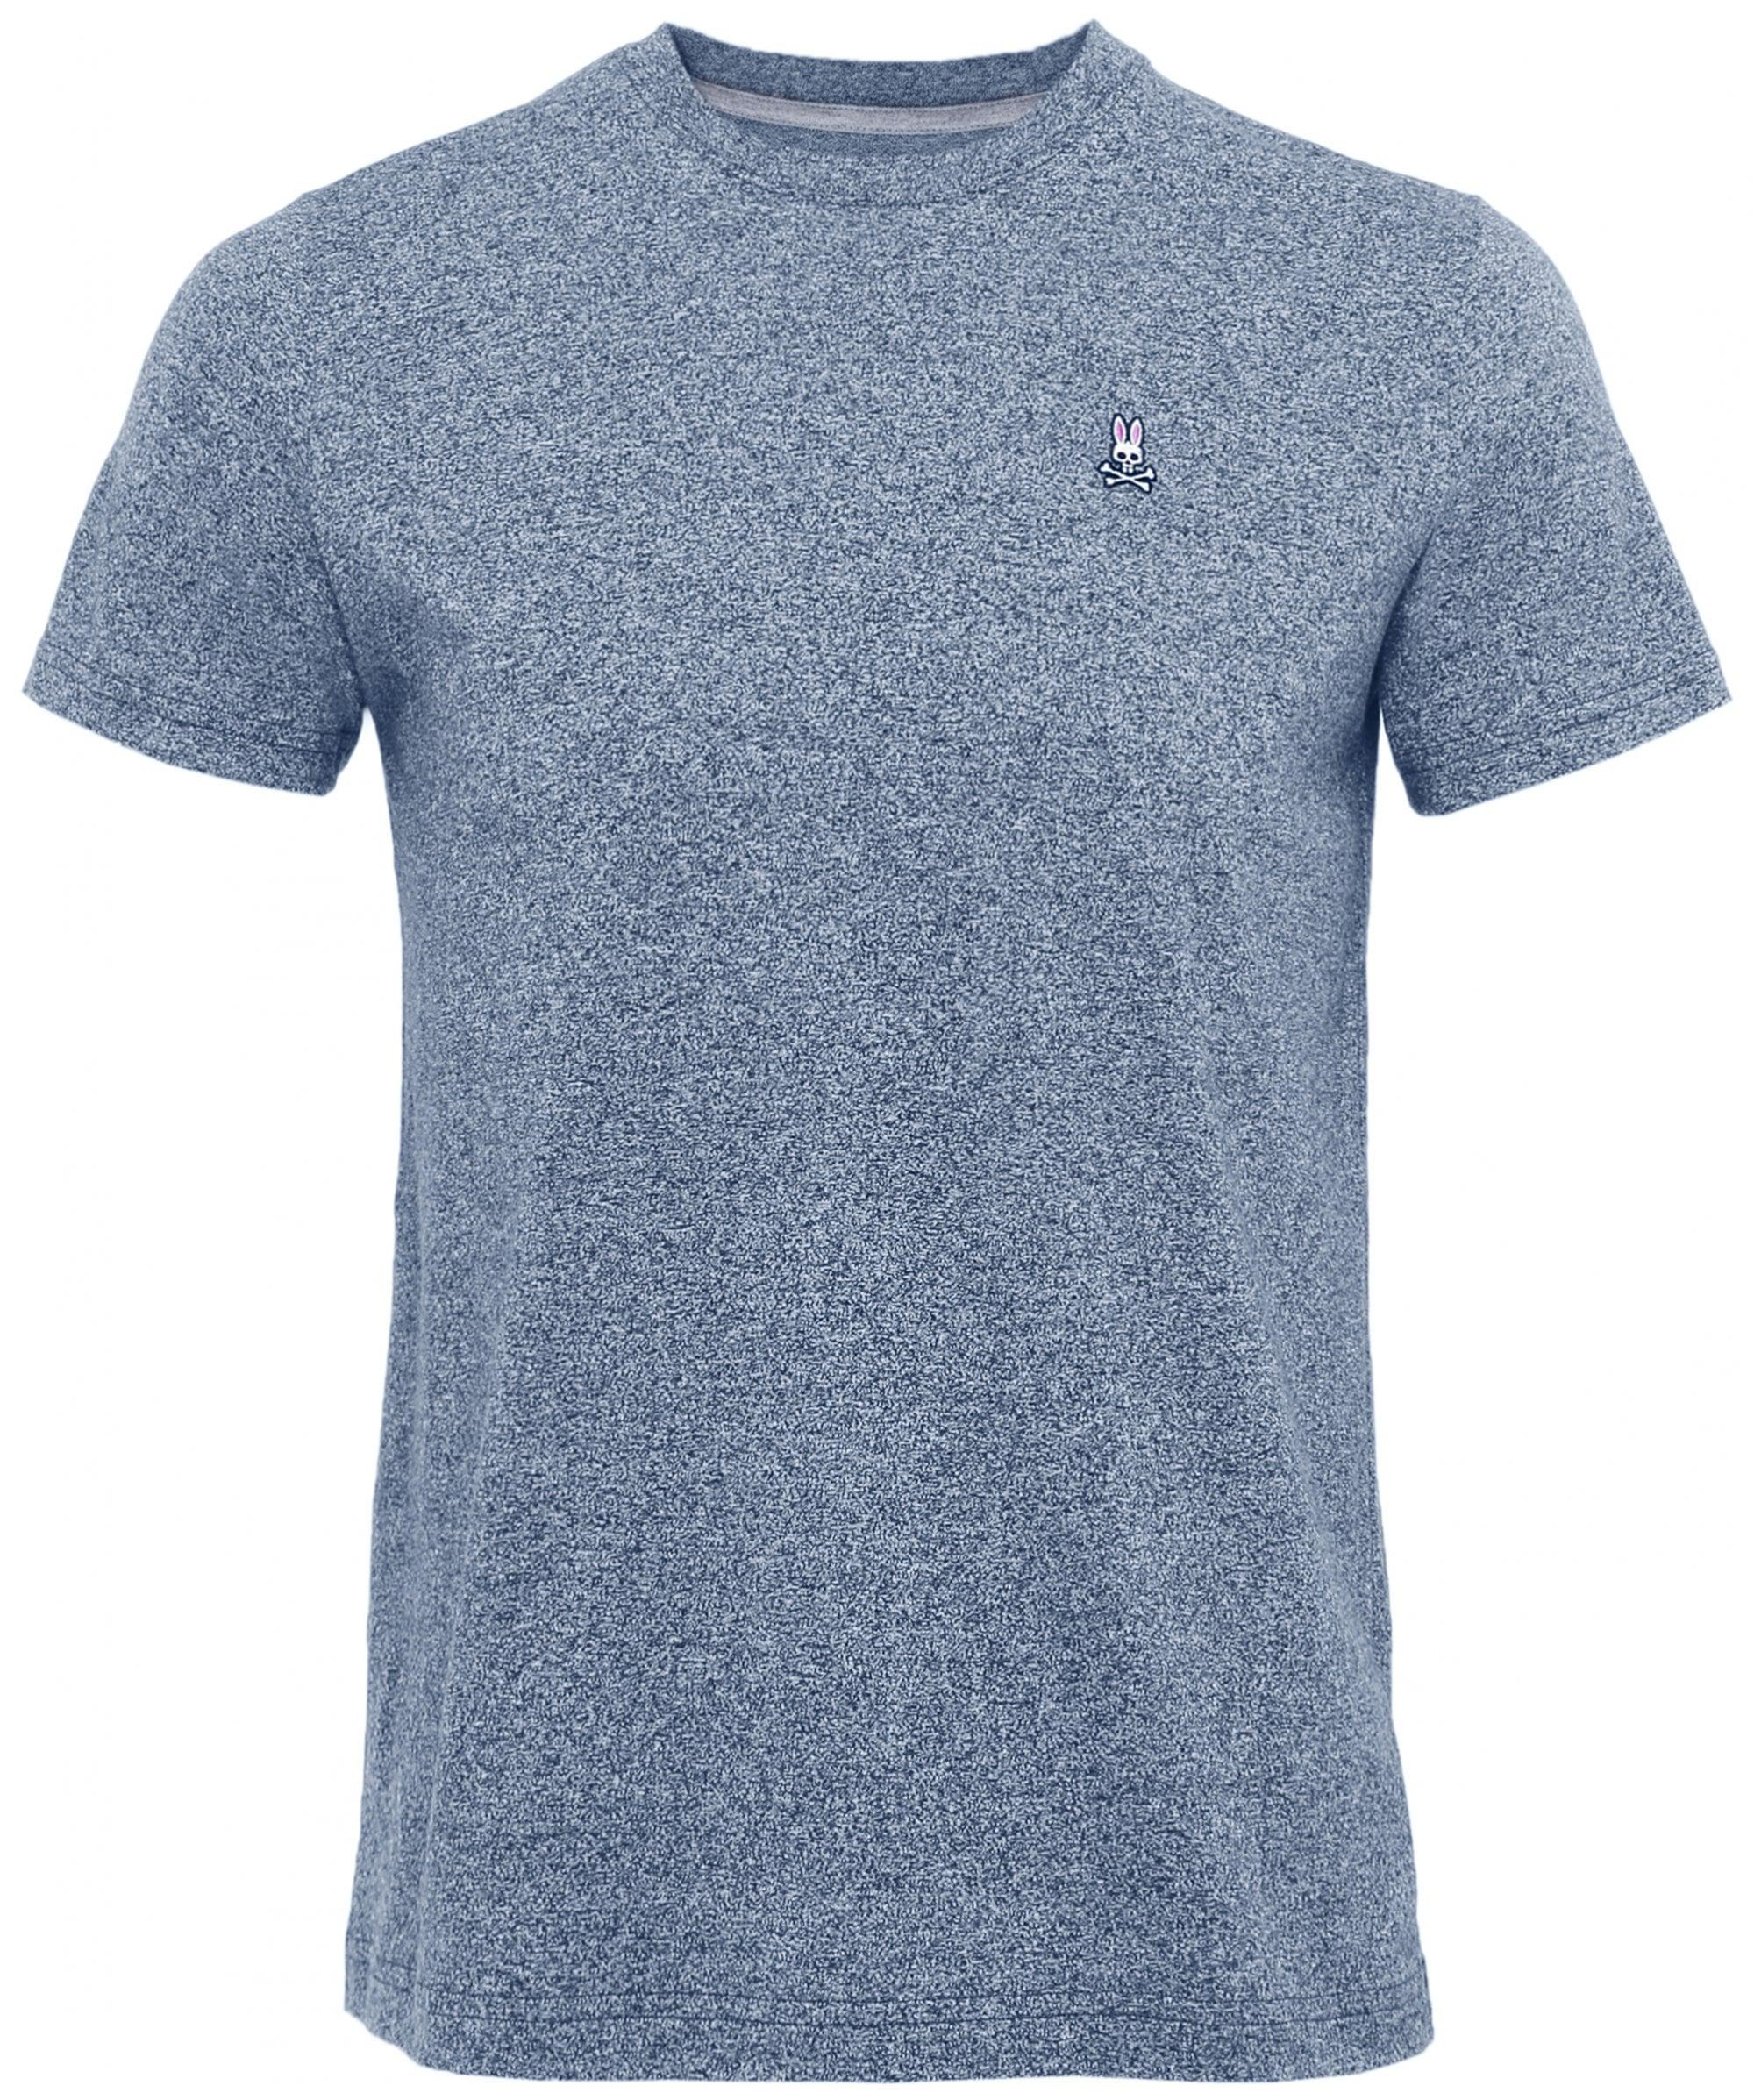 Psycho bunny pima cotton crew neck t shirt in blue for men for Pima cotton crew neck t shirt